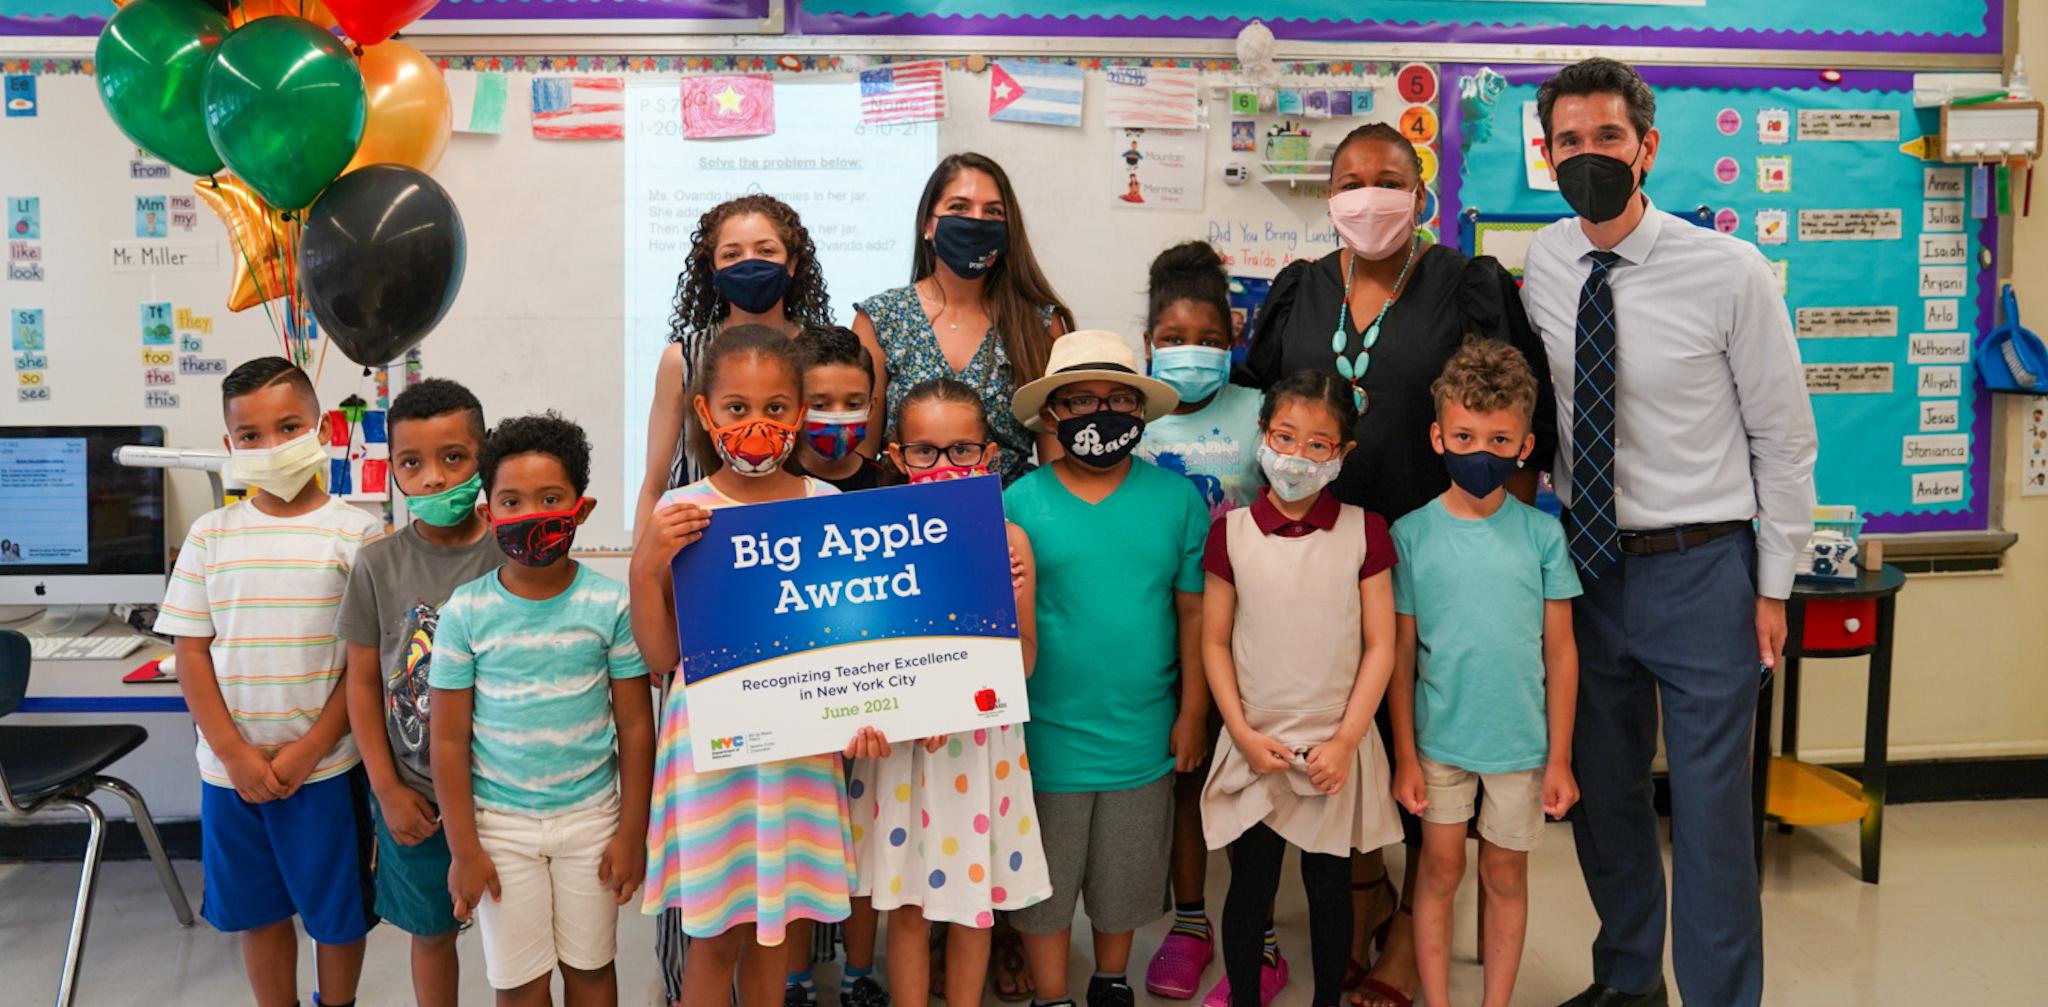 Class standing with teacher celebrating winning the Big Apple Award